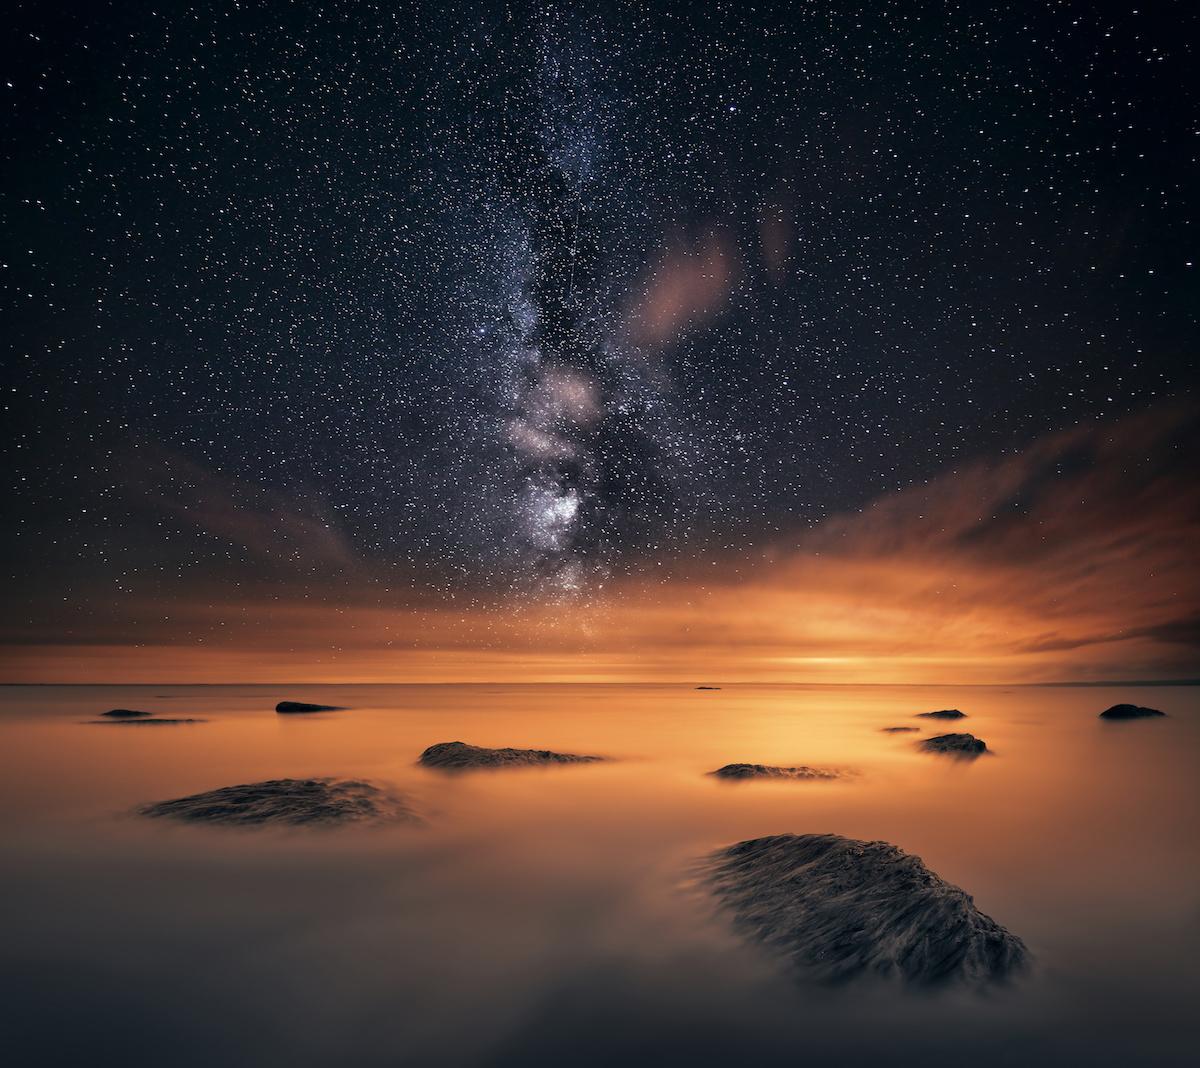 Stars at night, Lough Neagh, Northern Ireland, UK